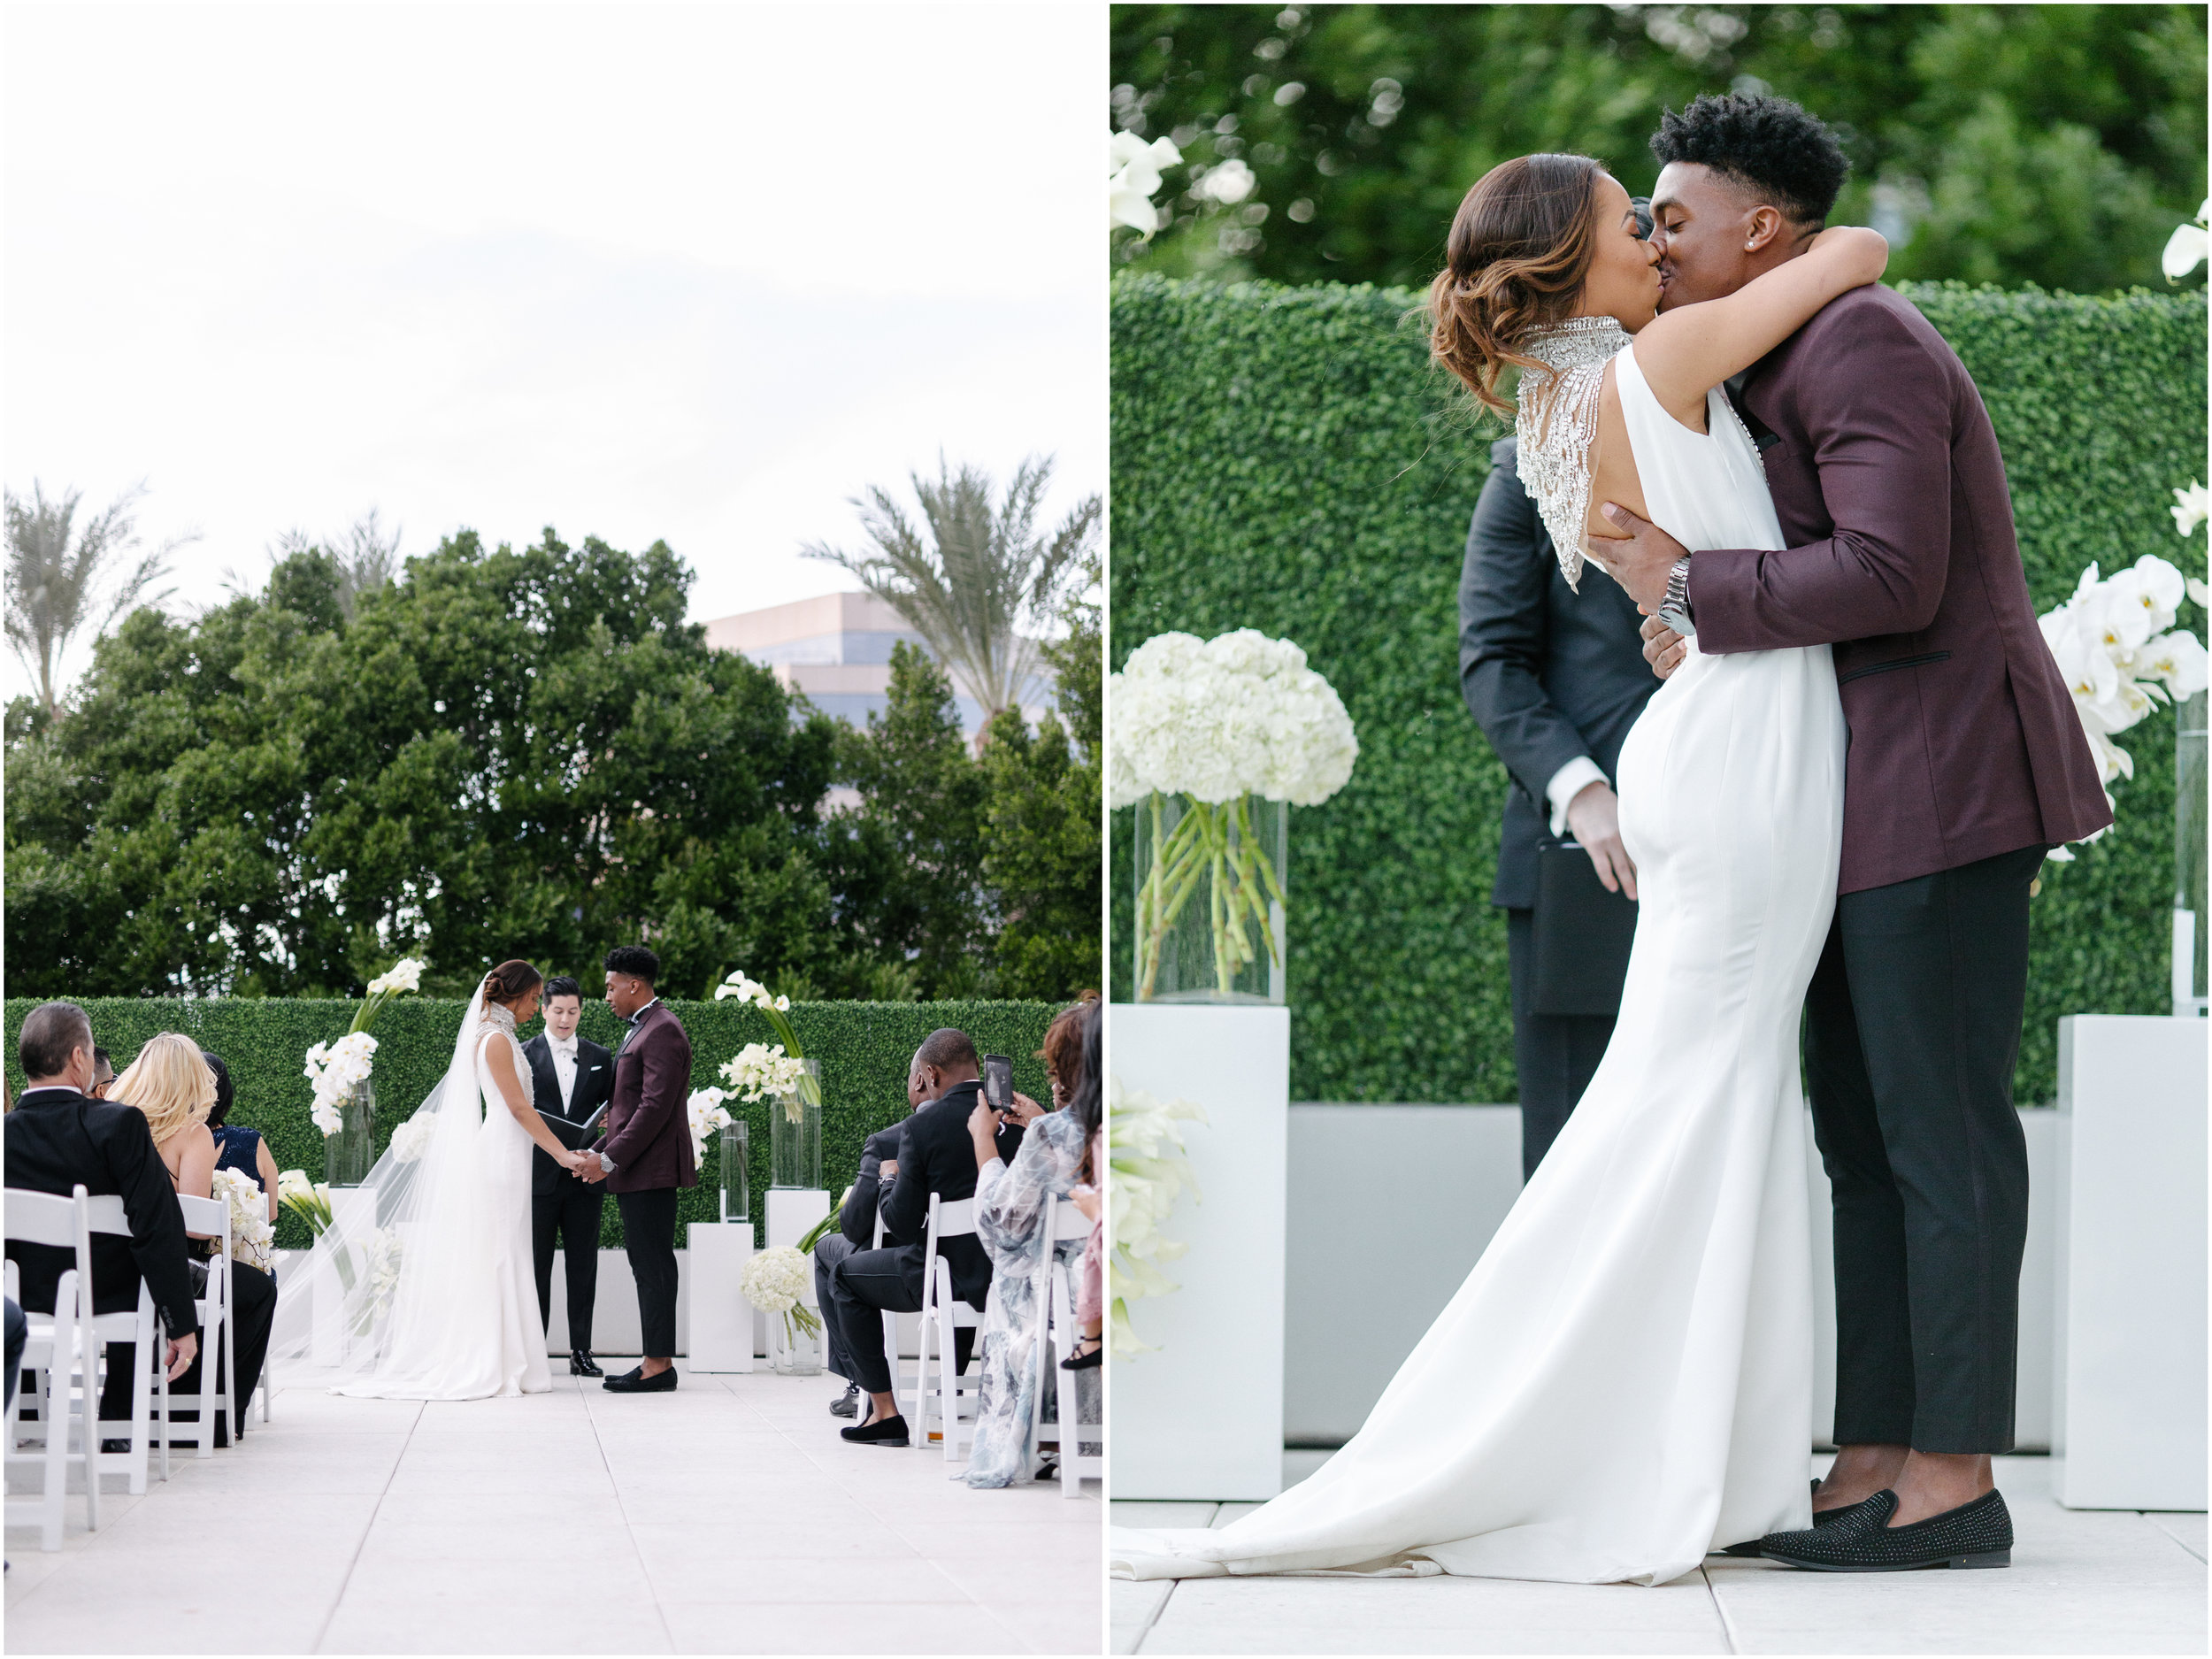 Camby_wedding_ceremony.jpg